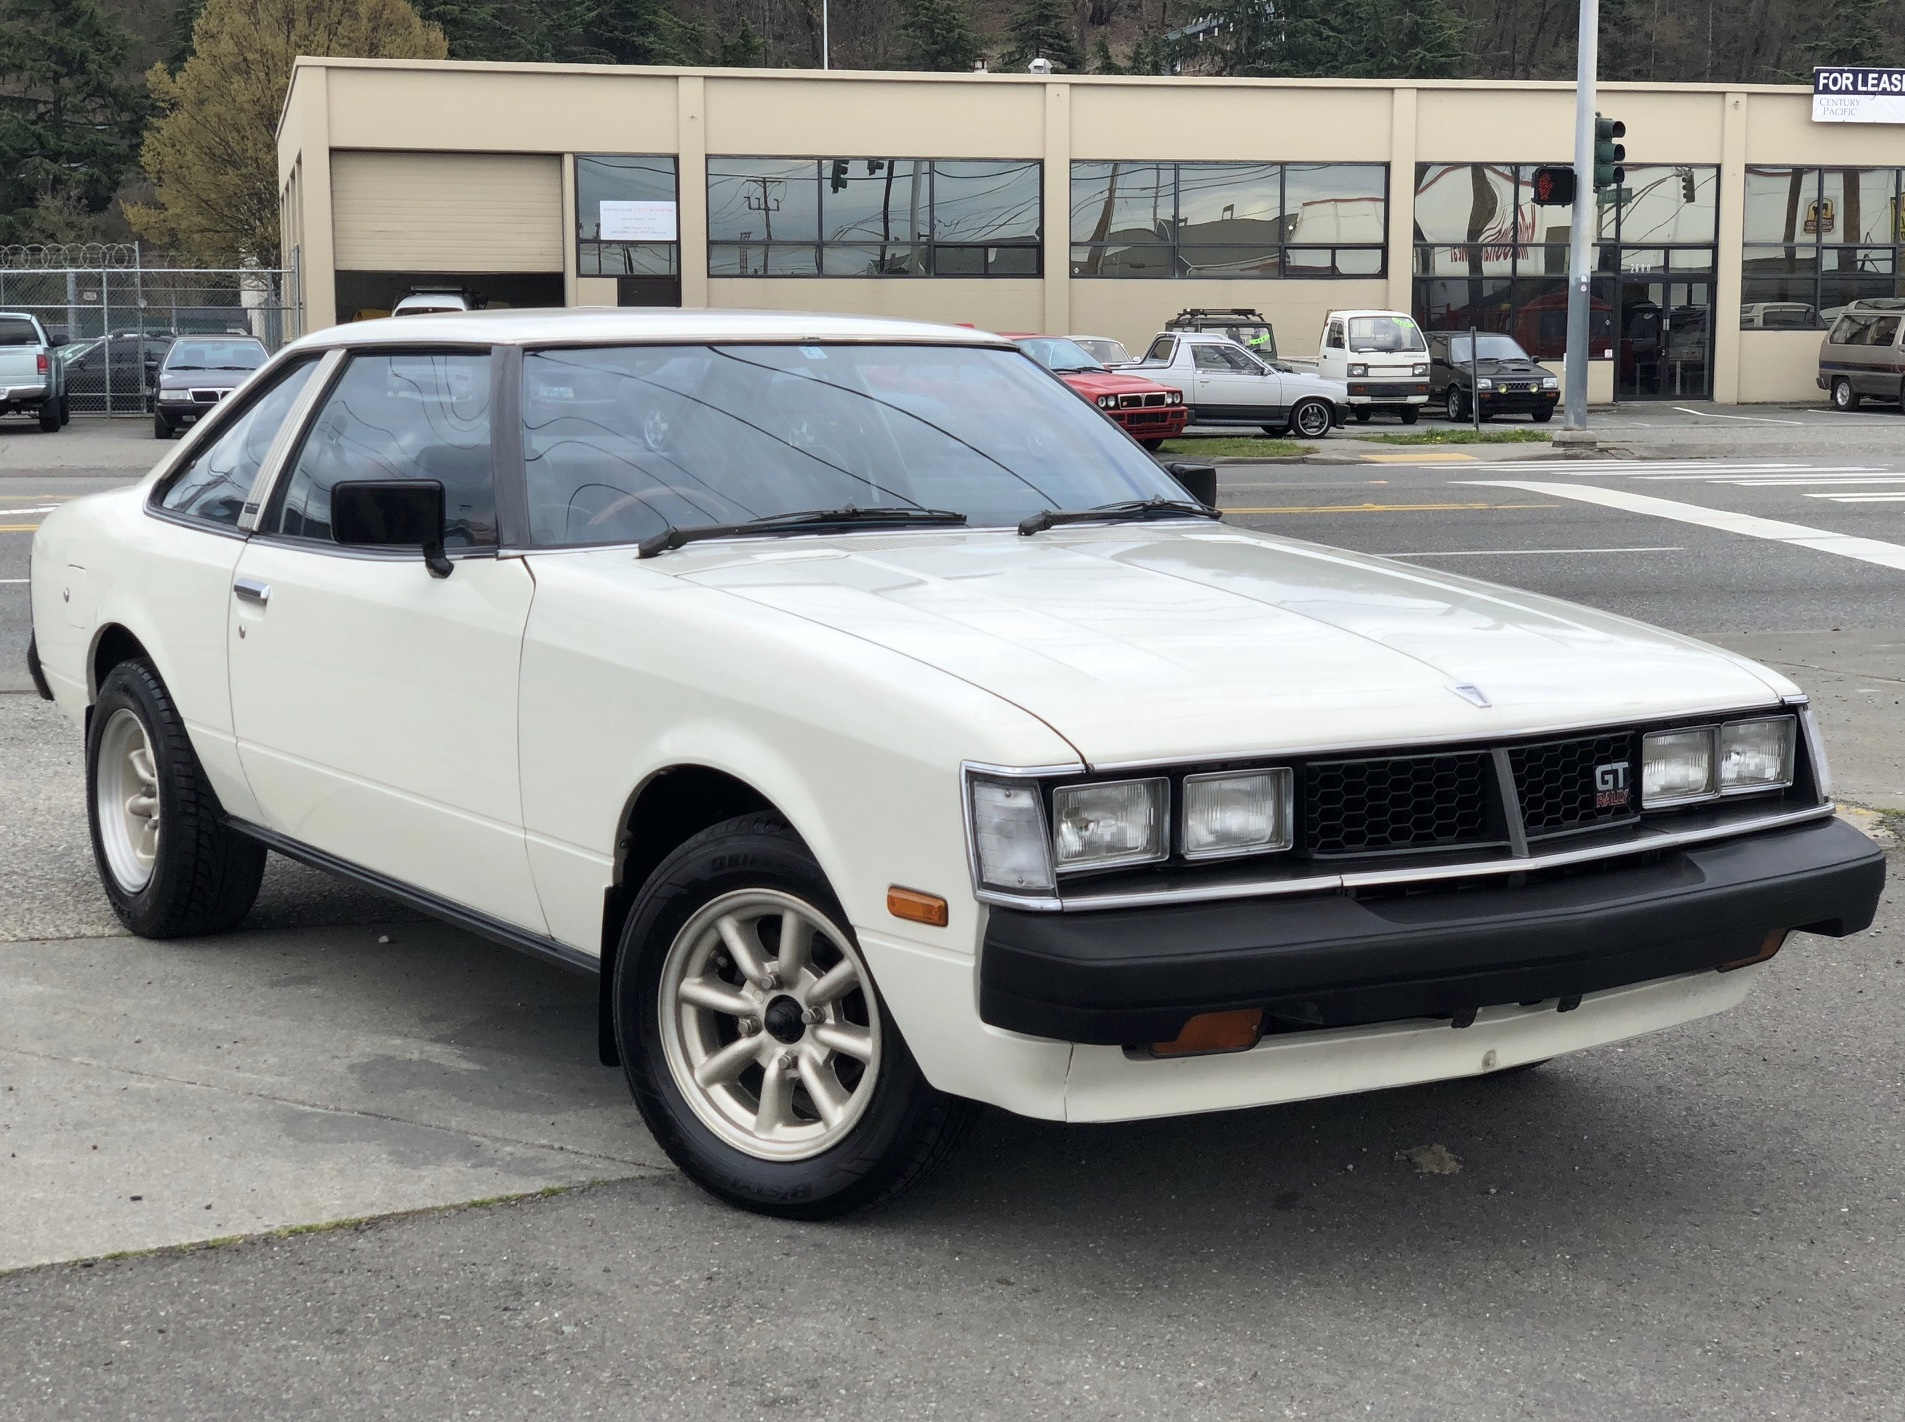 Kelebihan Toyota Celica 1980 Tangguh